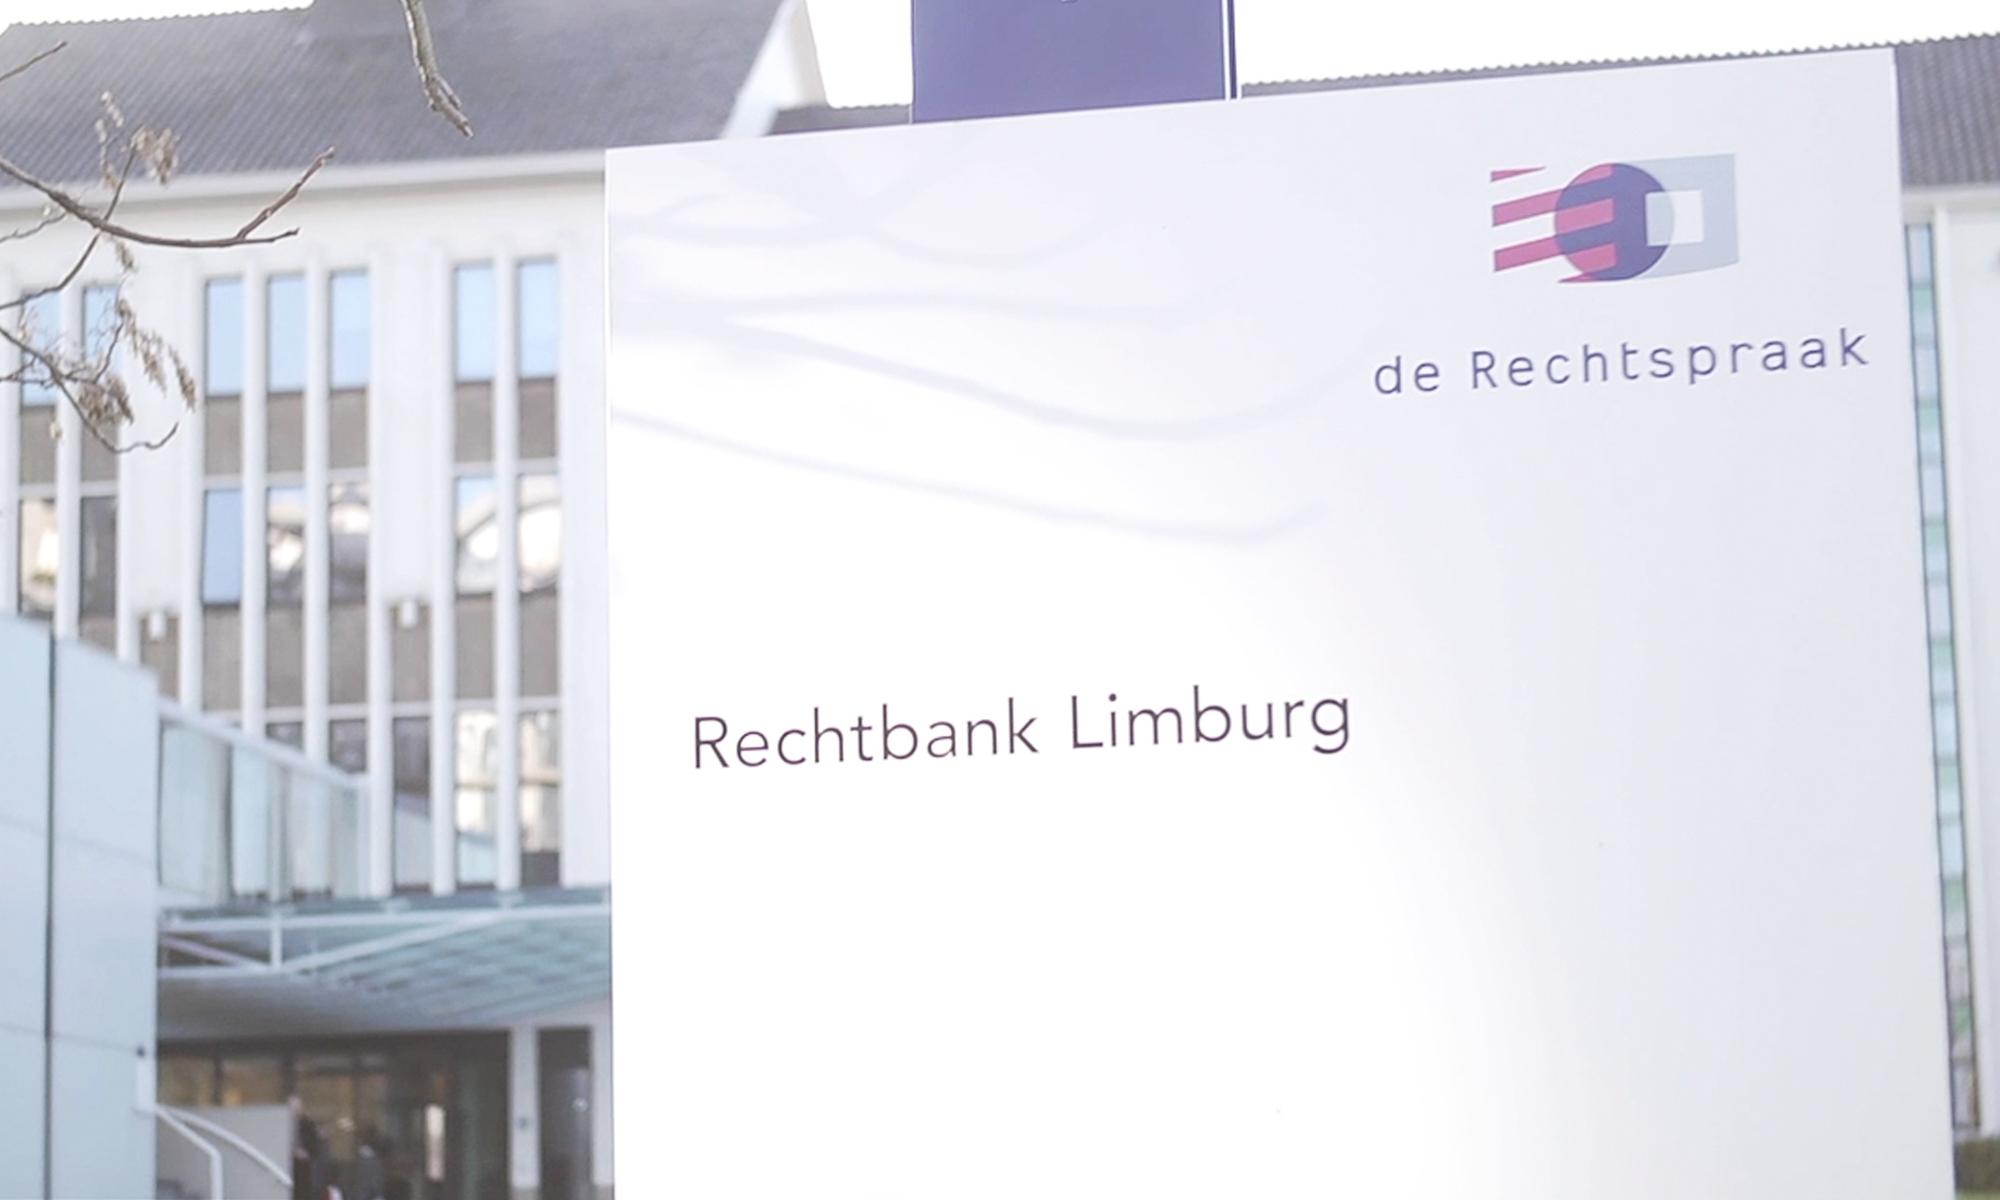 Openbaar Ministerie Limburg